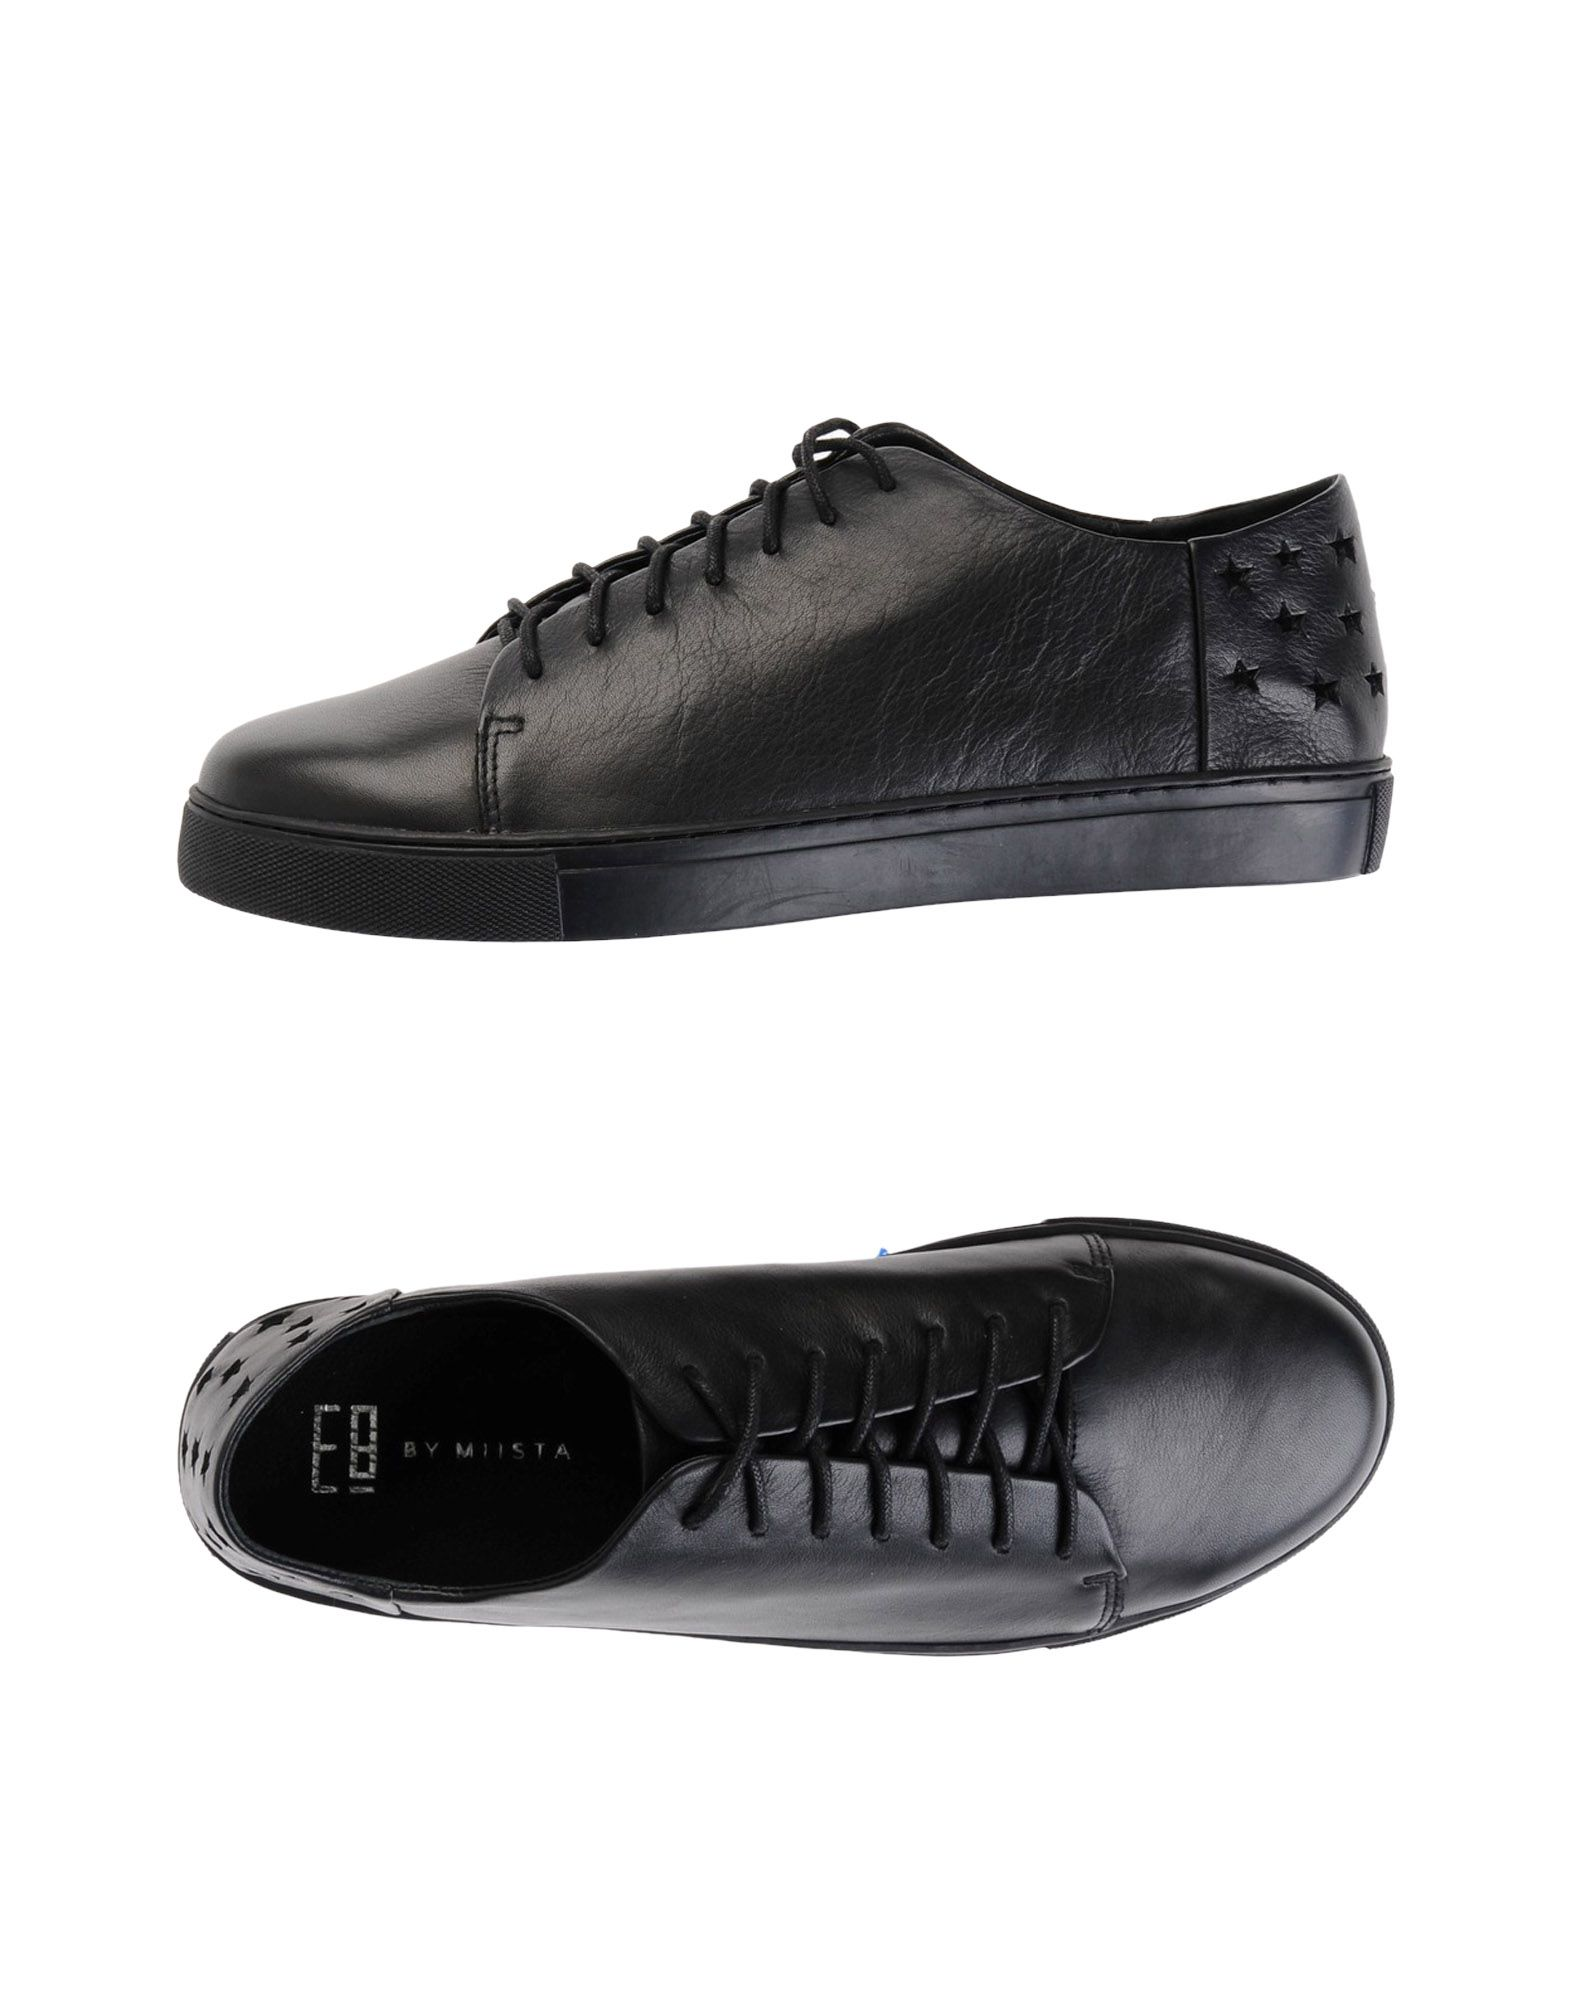 Sneakers E8 By Miista Hera - Donna - 11468916VX